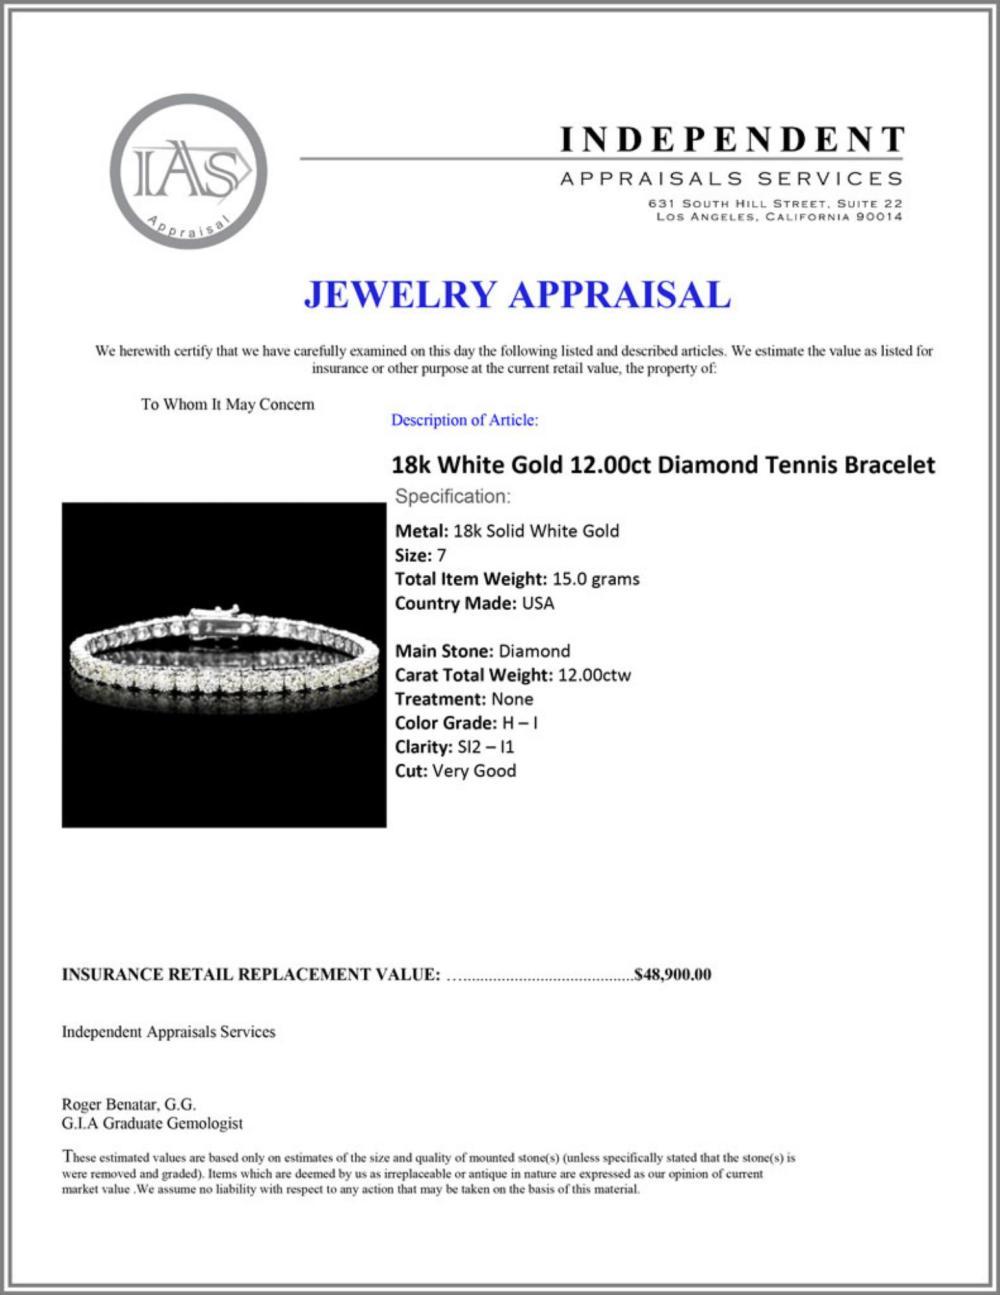 Lot 28: ^18k White Gold 12.00ct Diamond Tennis Bracelet